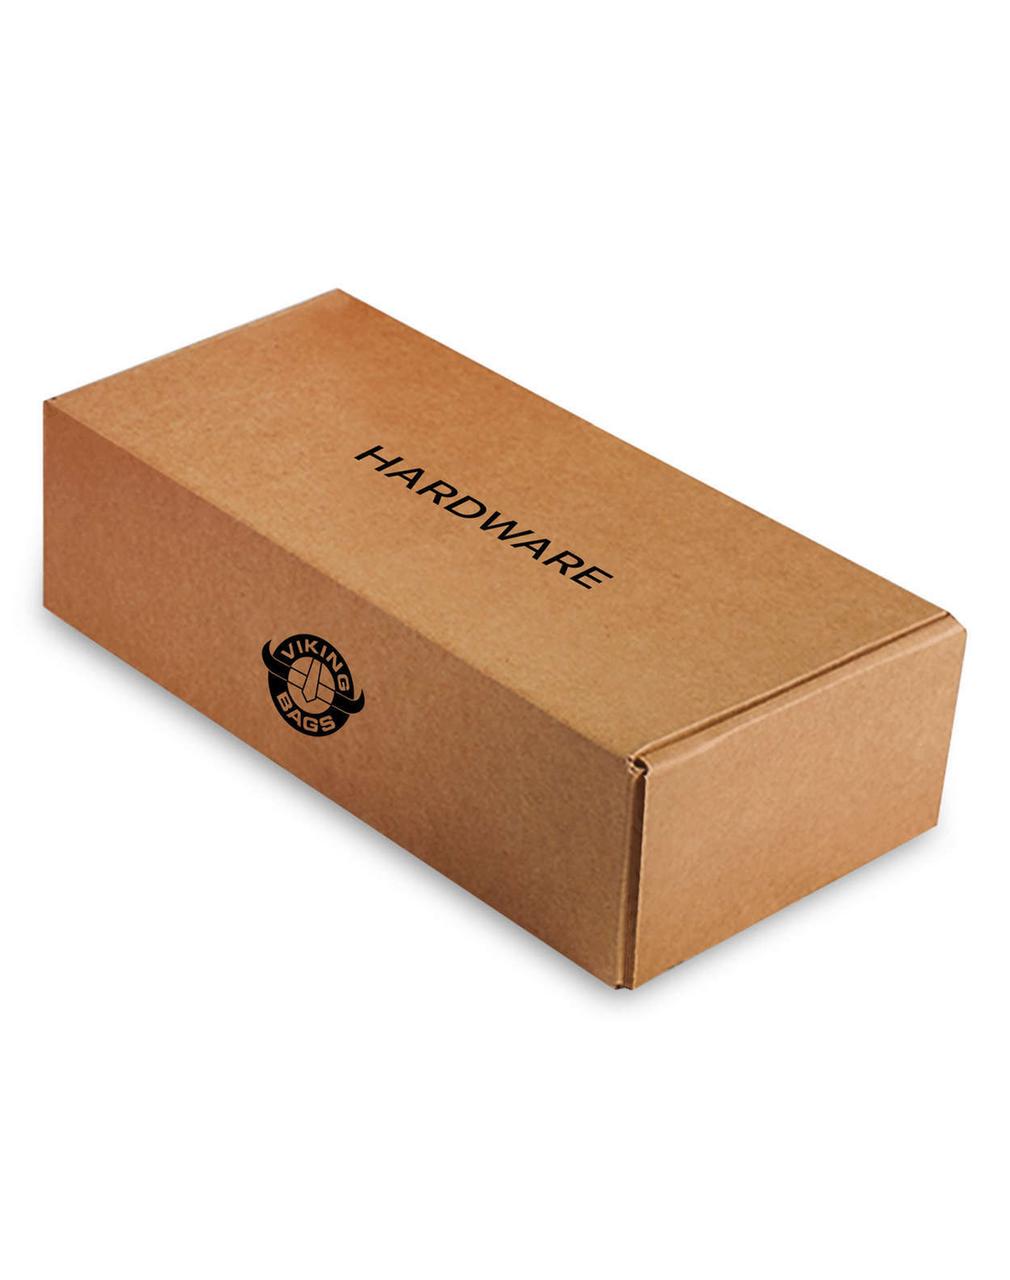 Boulevard M50, VZ800 SS Side Pocket Studded Saddlebags Box